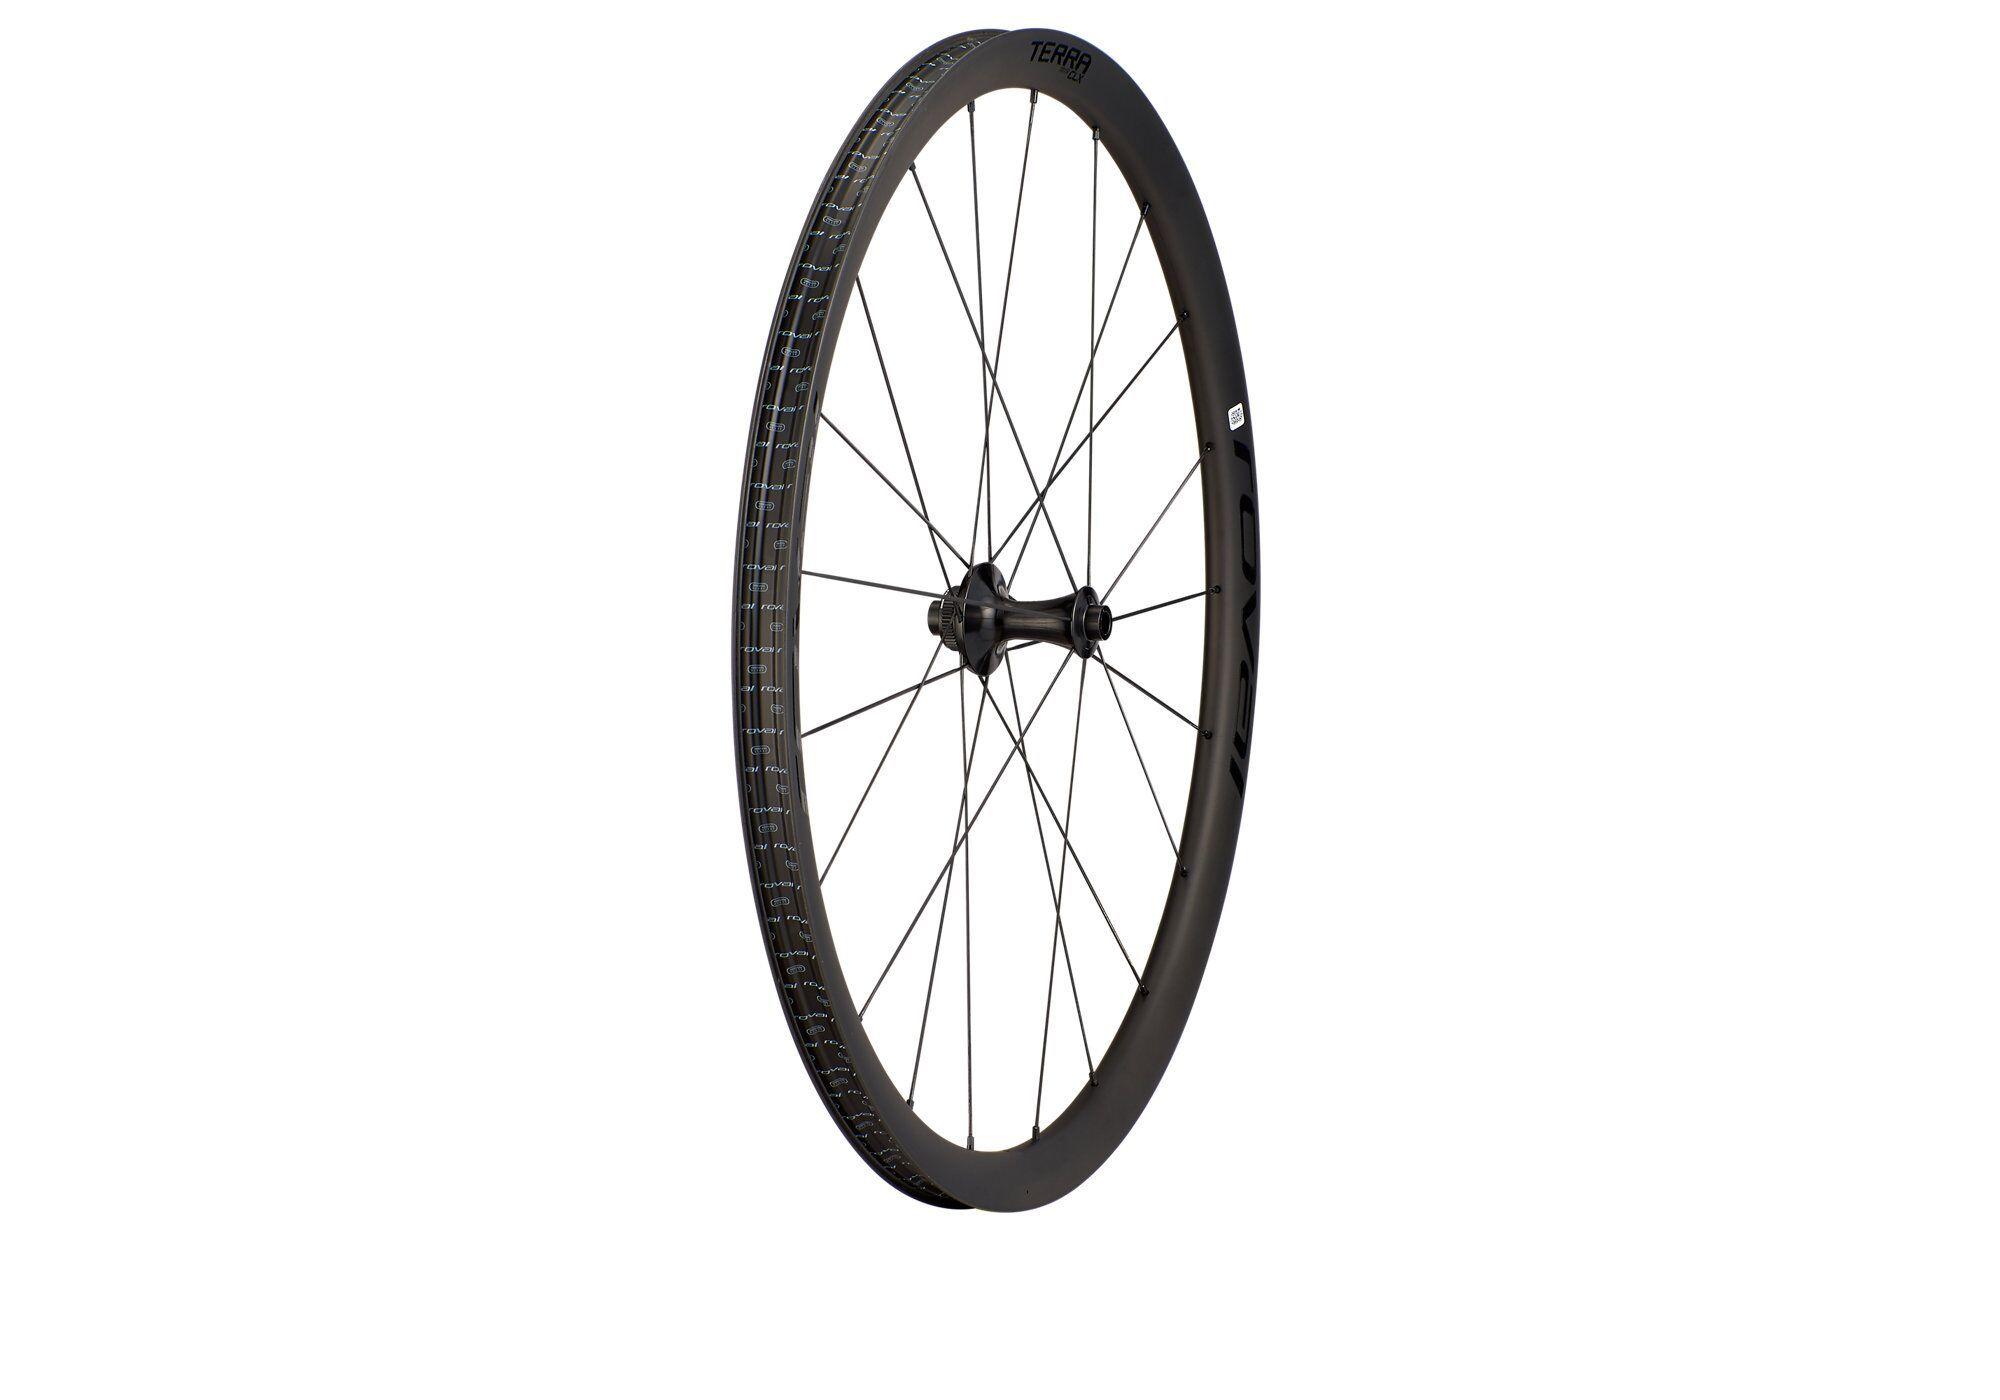 Roval Terra Clx Front Wheel 2020 | Wheelset